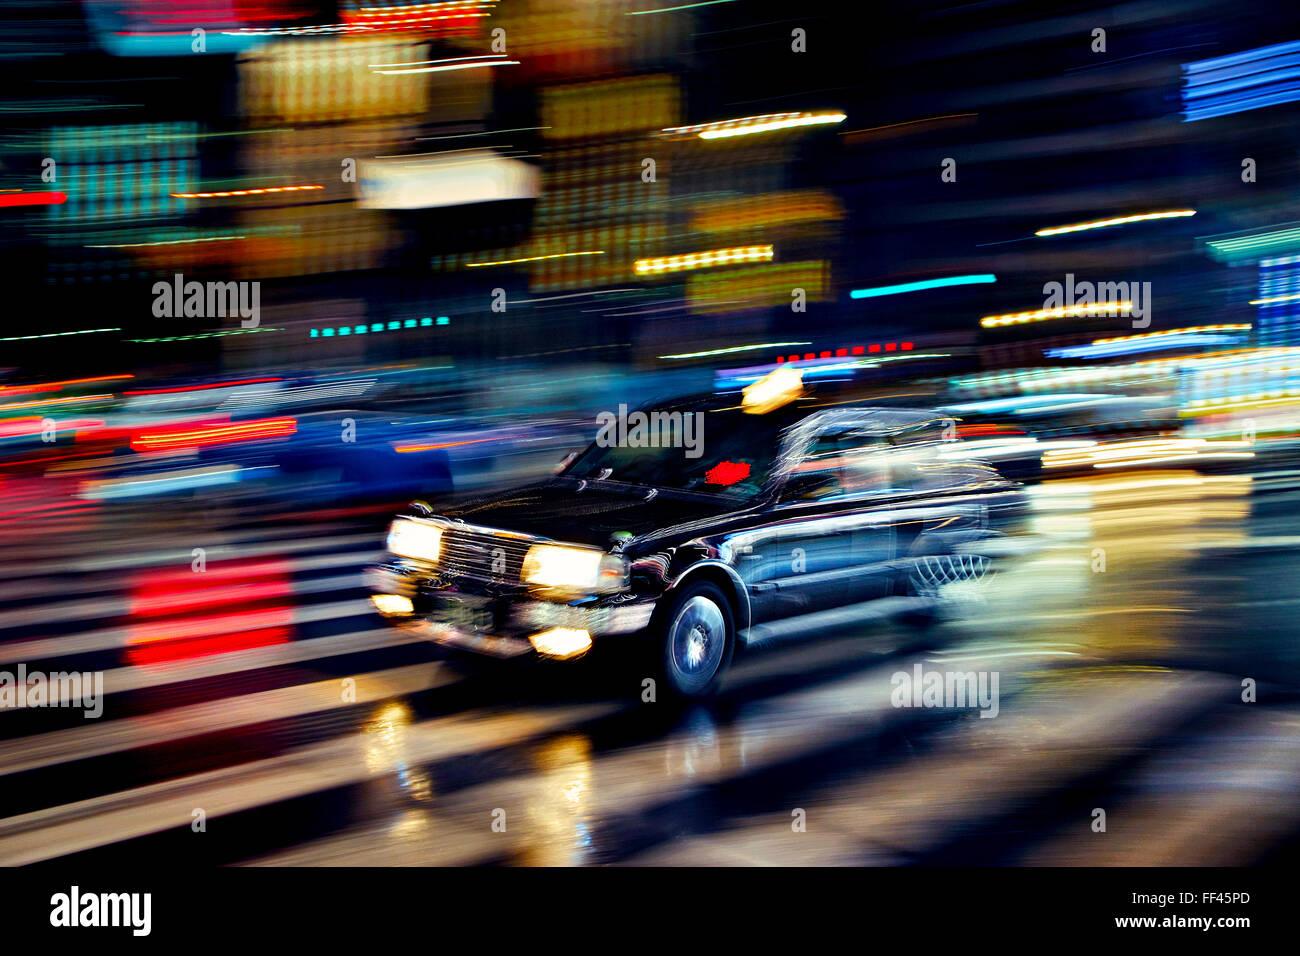 Japan, Honshu-Insel, Kanto, Tokio, Taxi in der Nacht. Stockbild